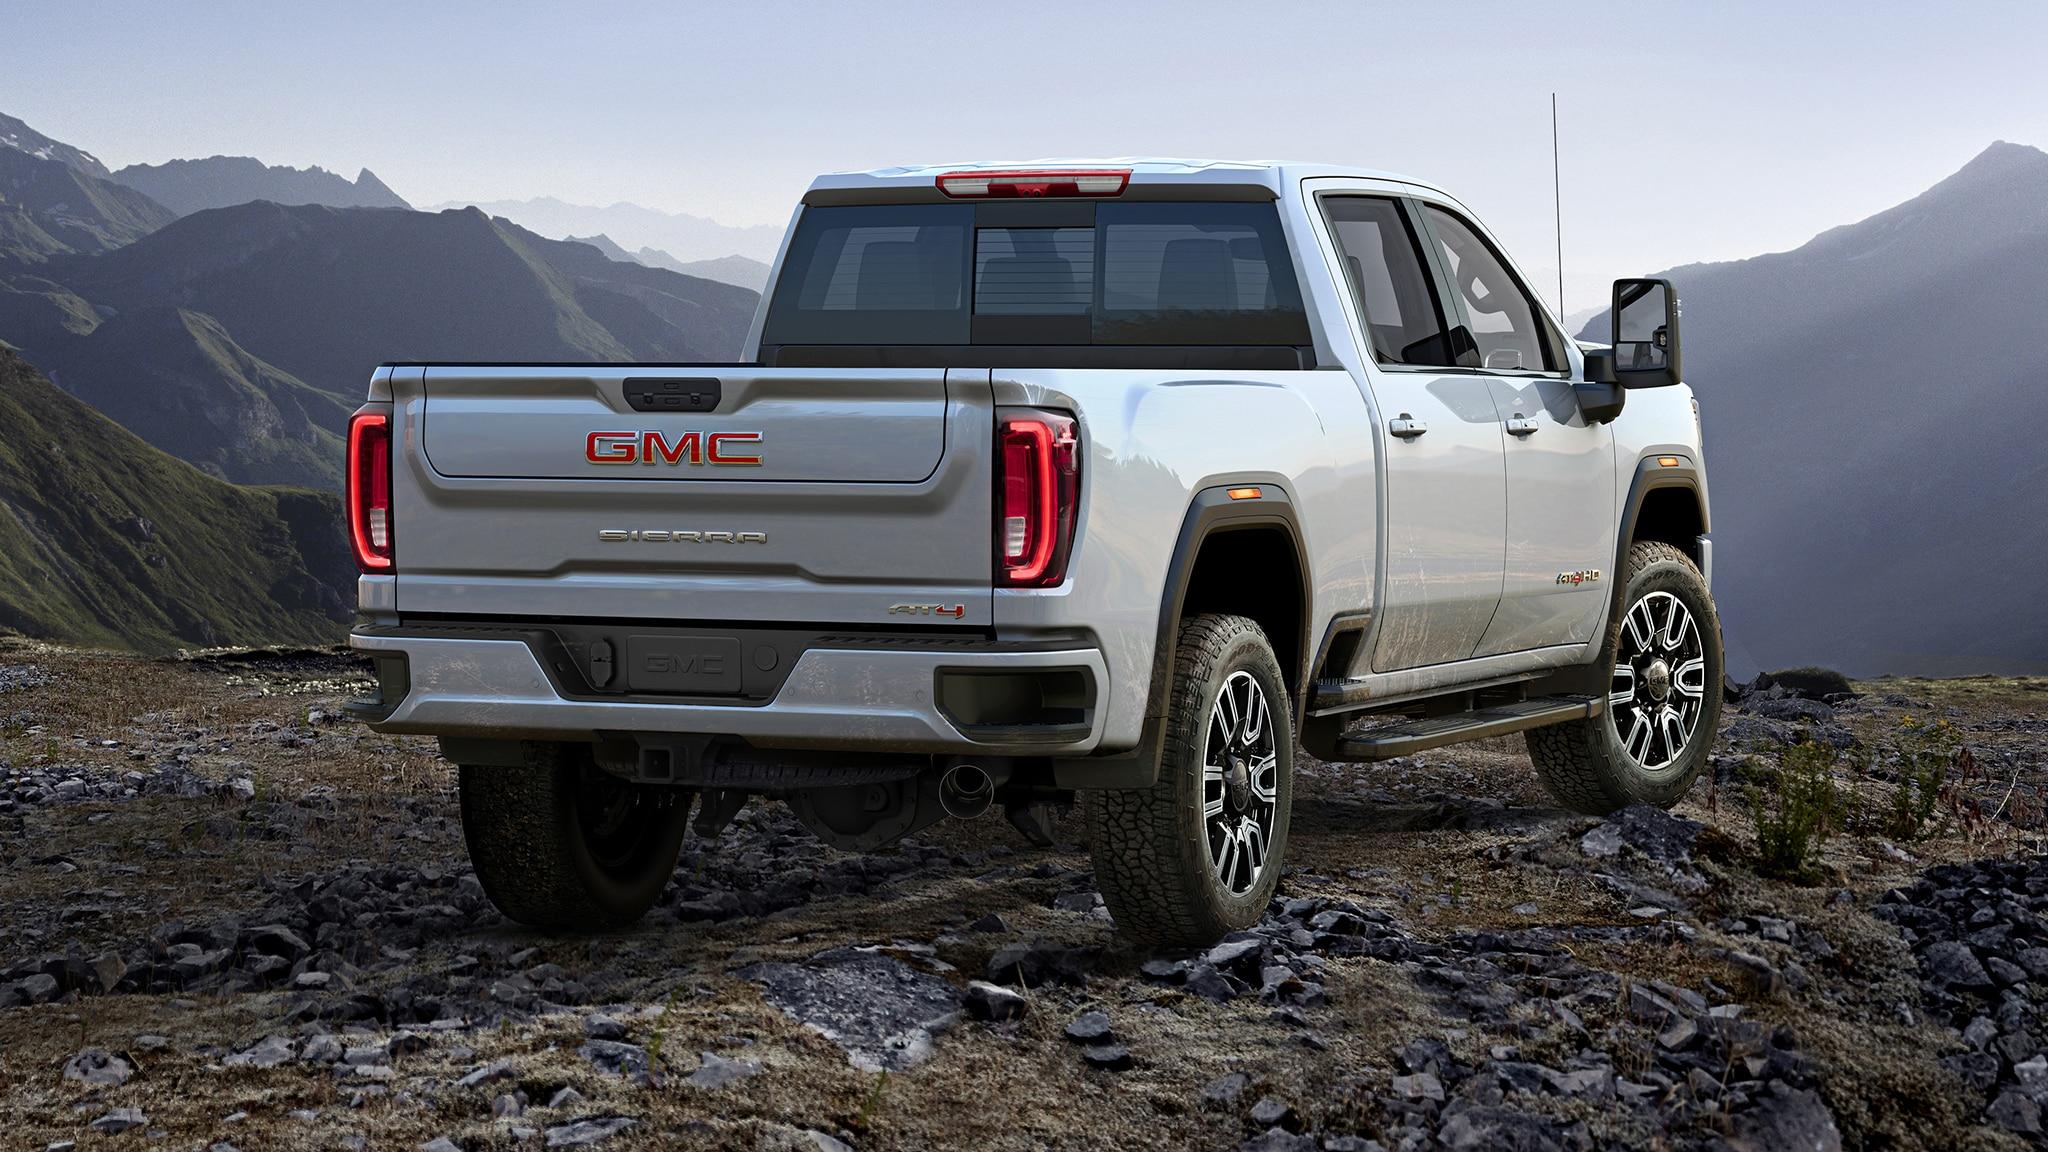 gmc sierra hd debuts huge grille huge capability automobile magazine